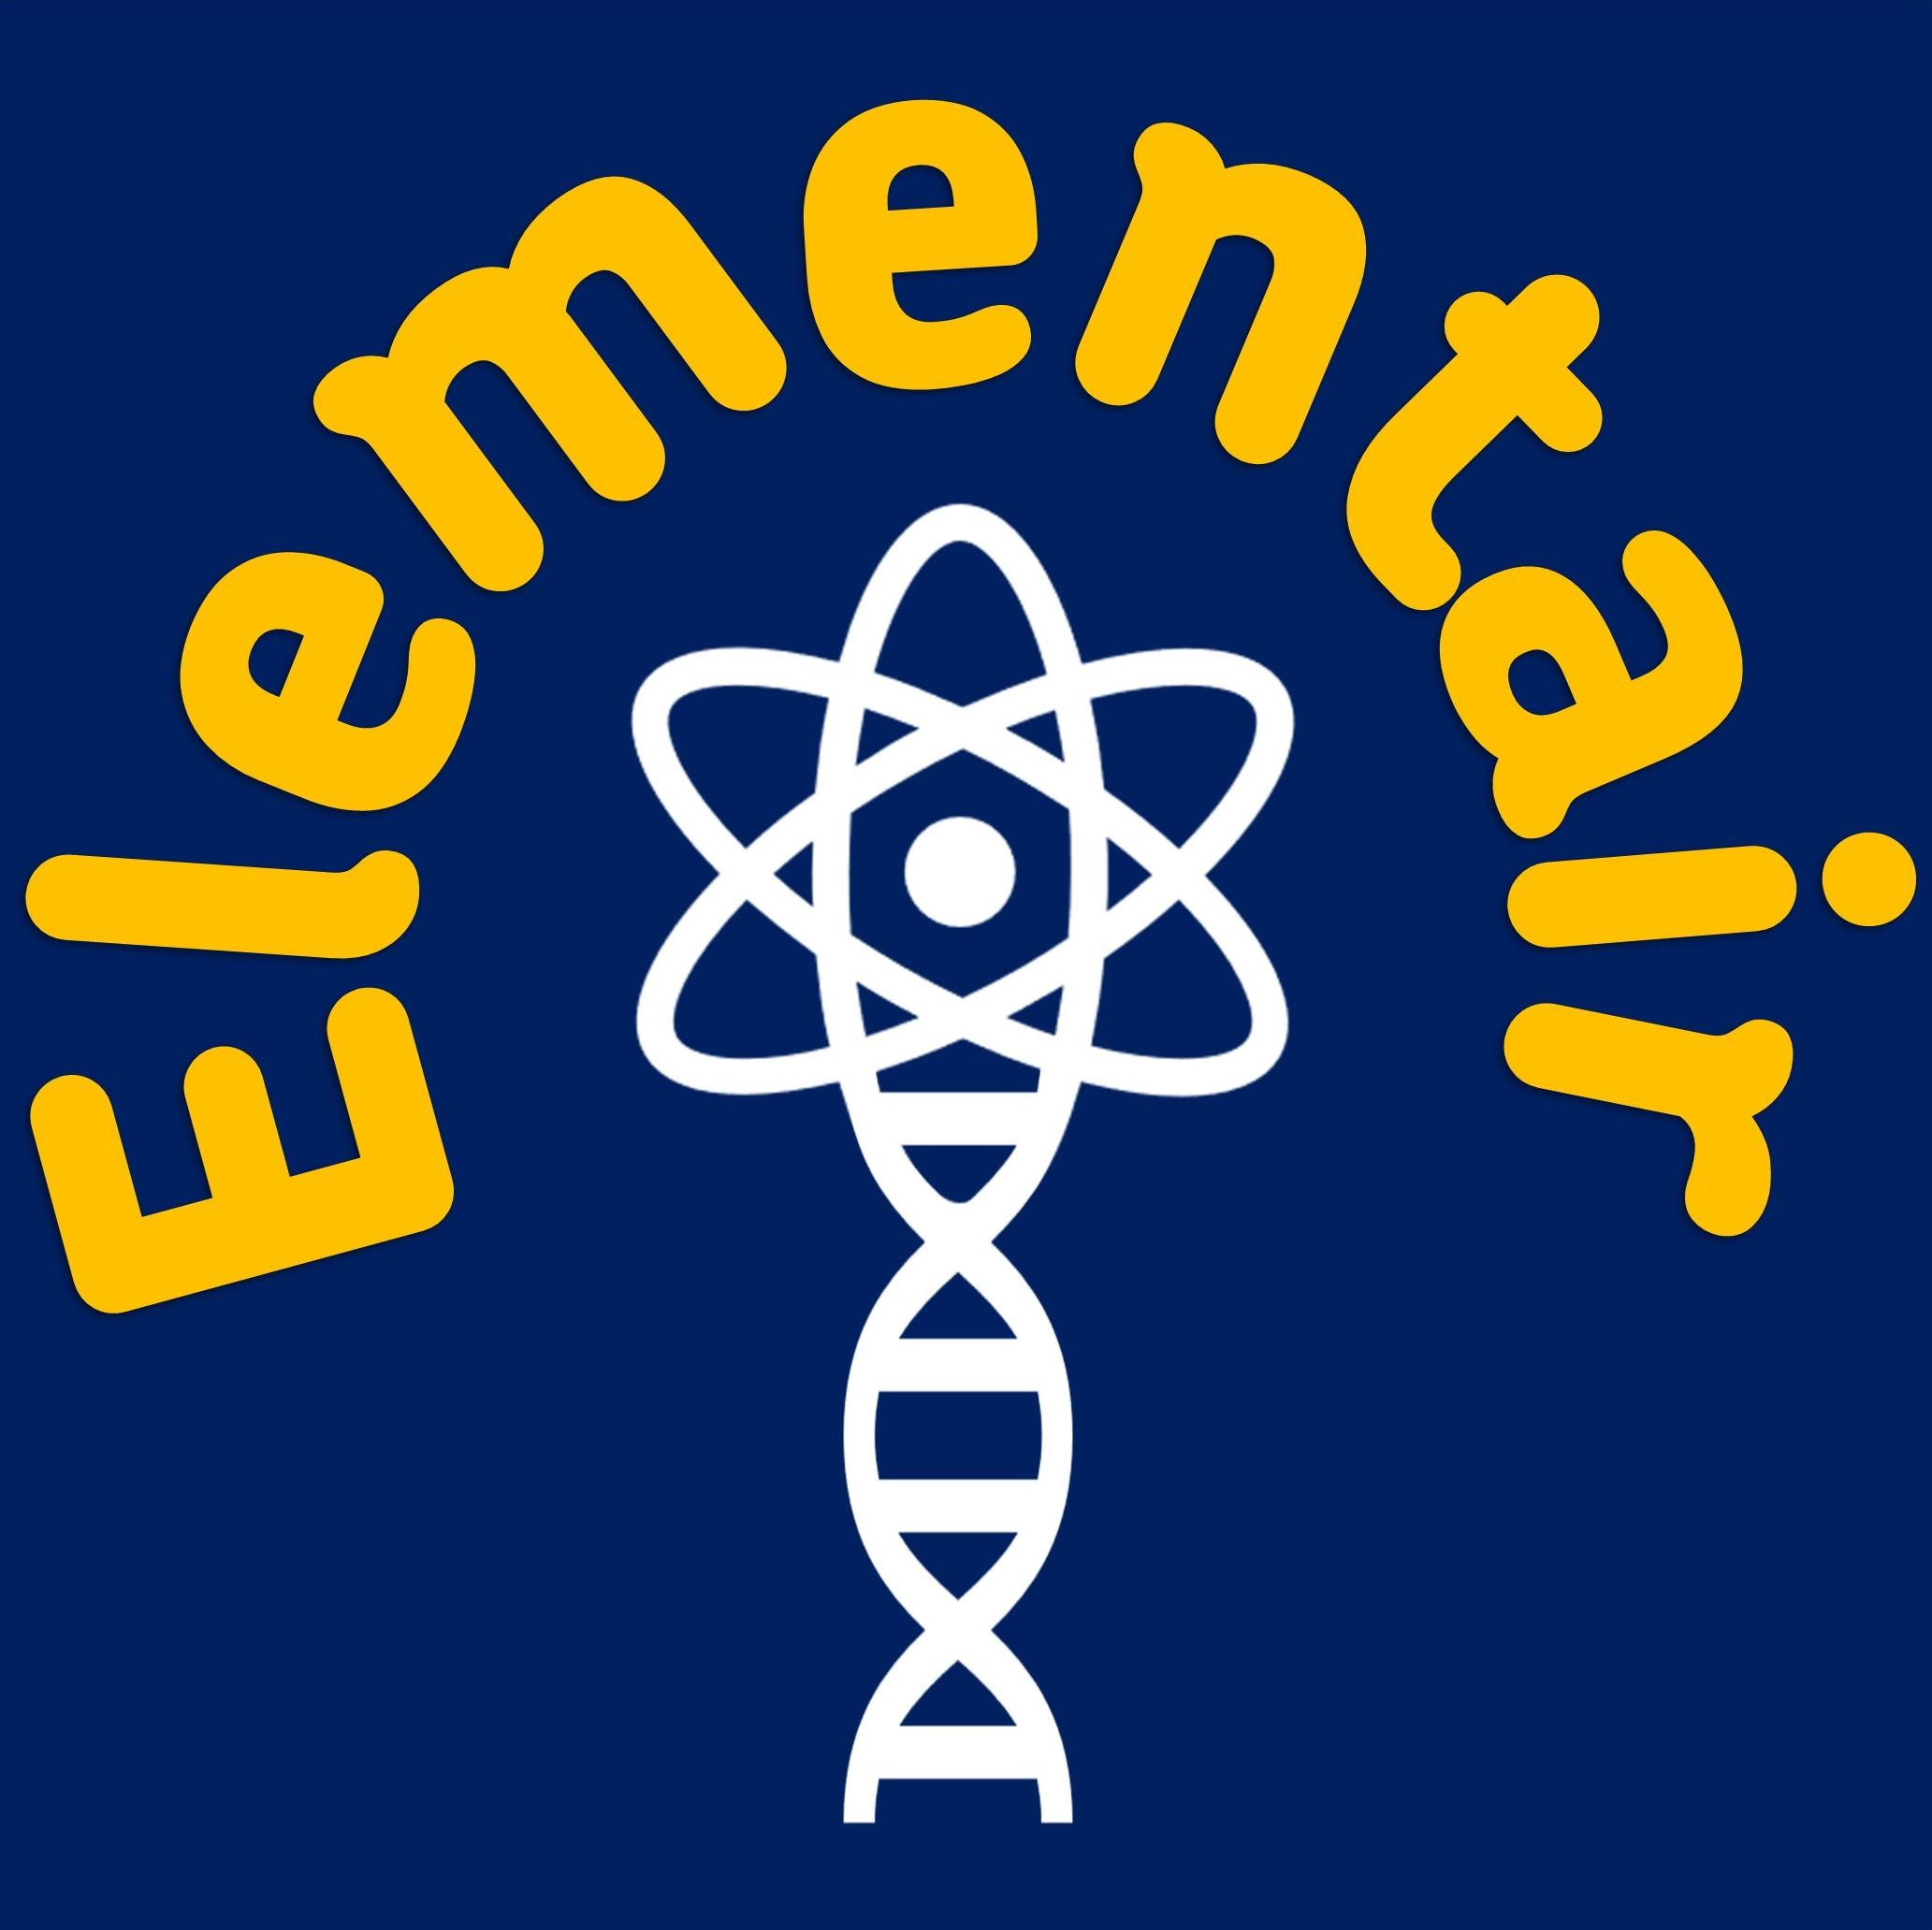 Elementair show image